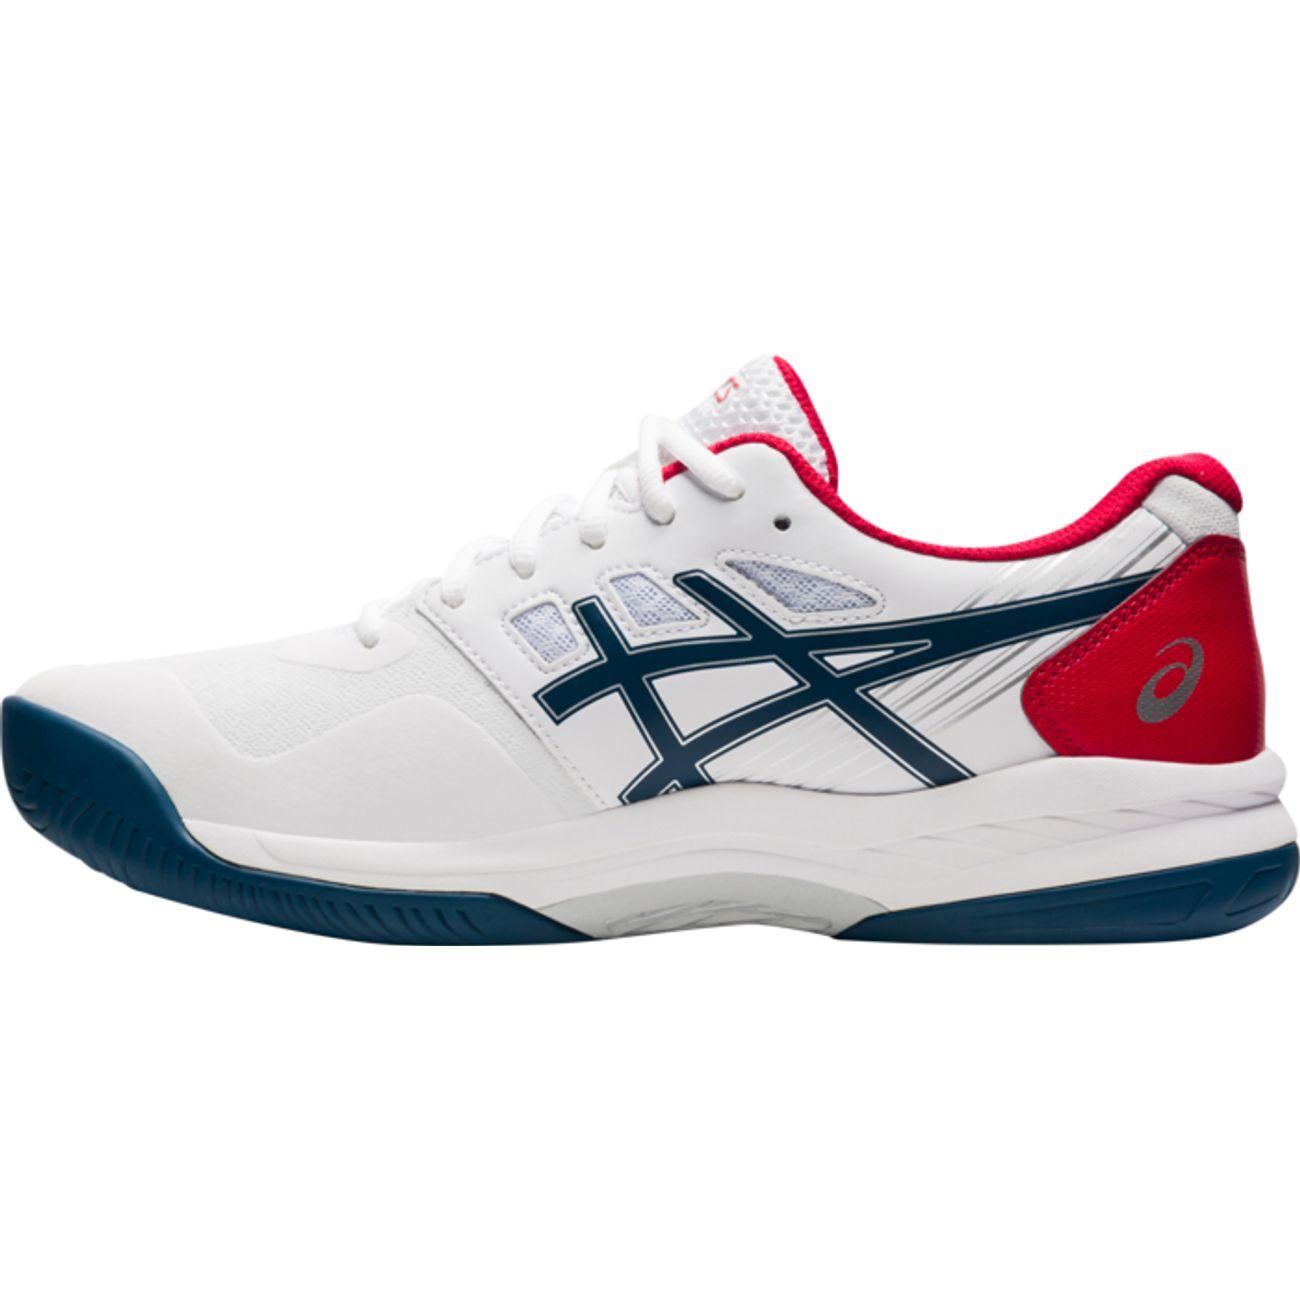 Chaussures de tennis  homme ASICS GEL-GAME 8